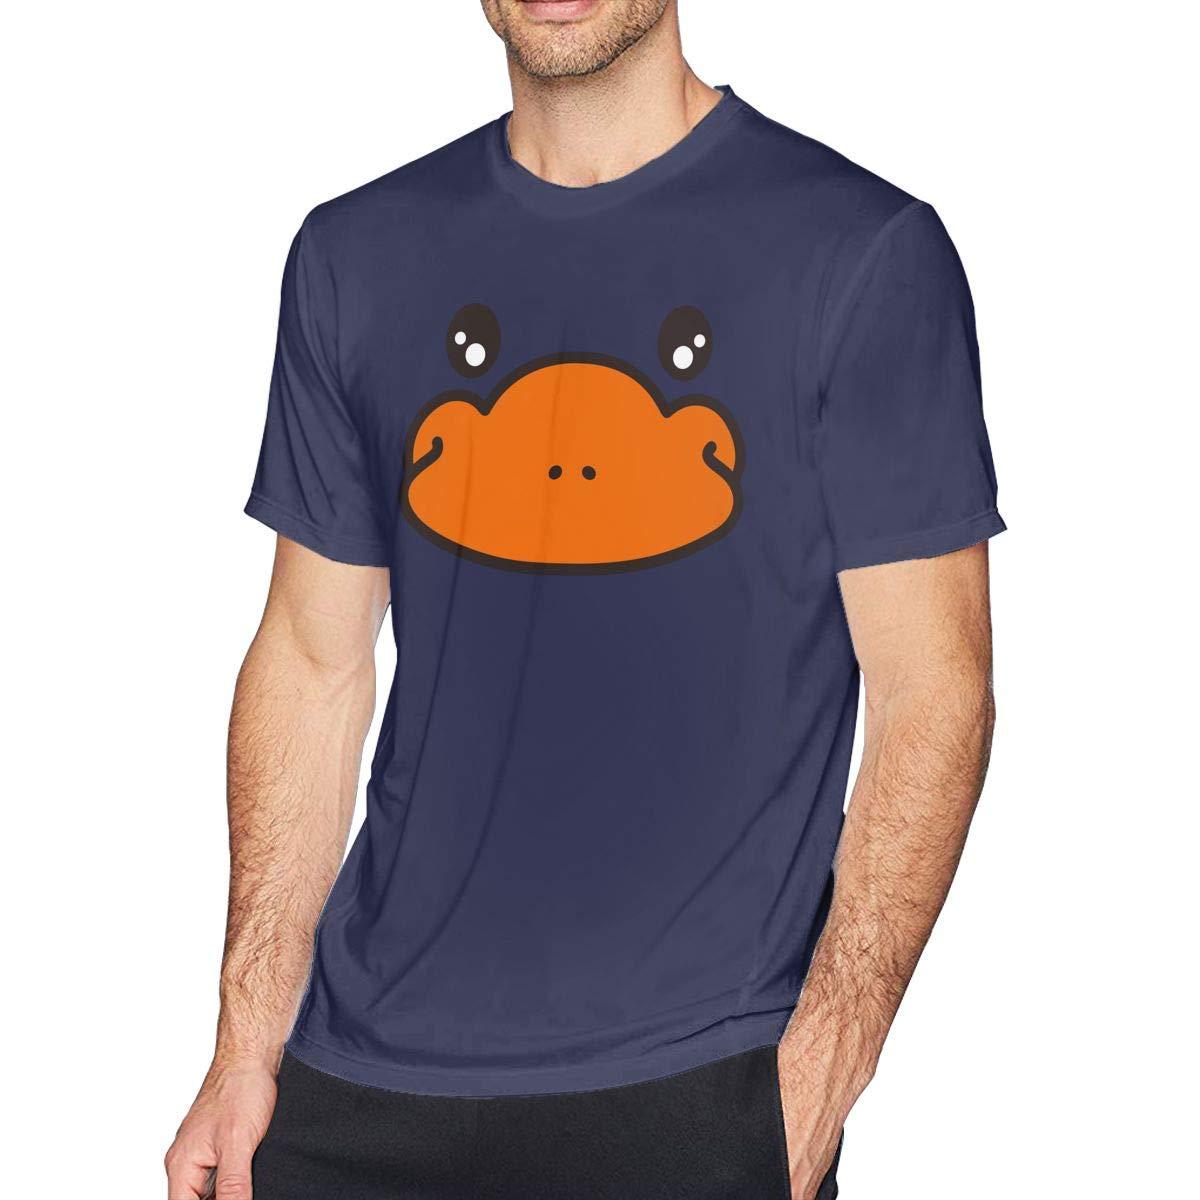 SHENGN Mens Customized Platypus Face O-Neck Ironic T Shirts Deep Heather